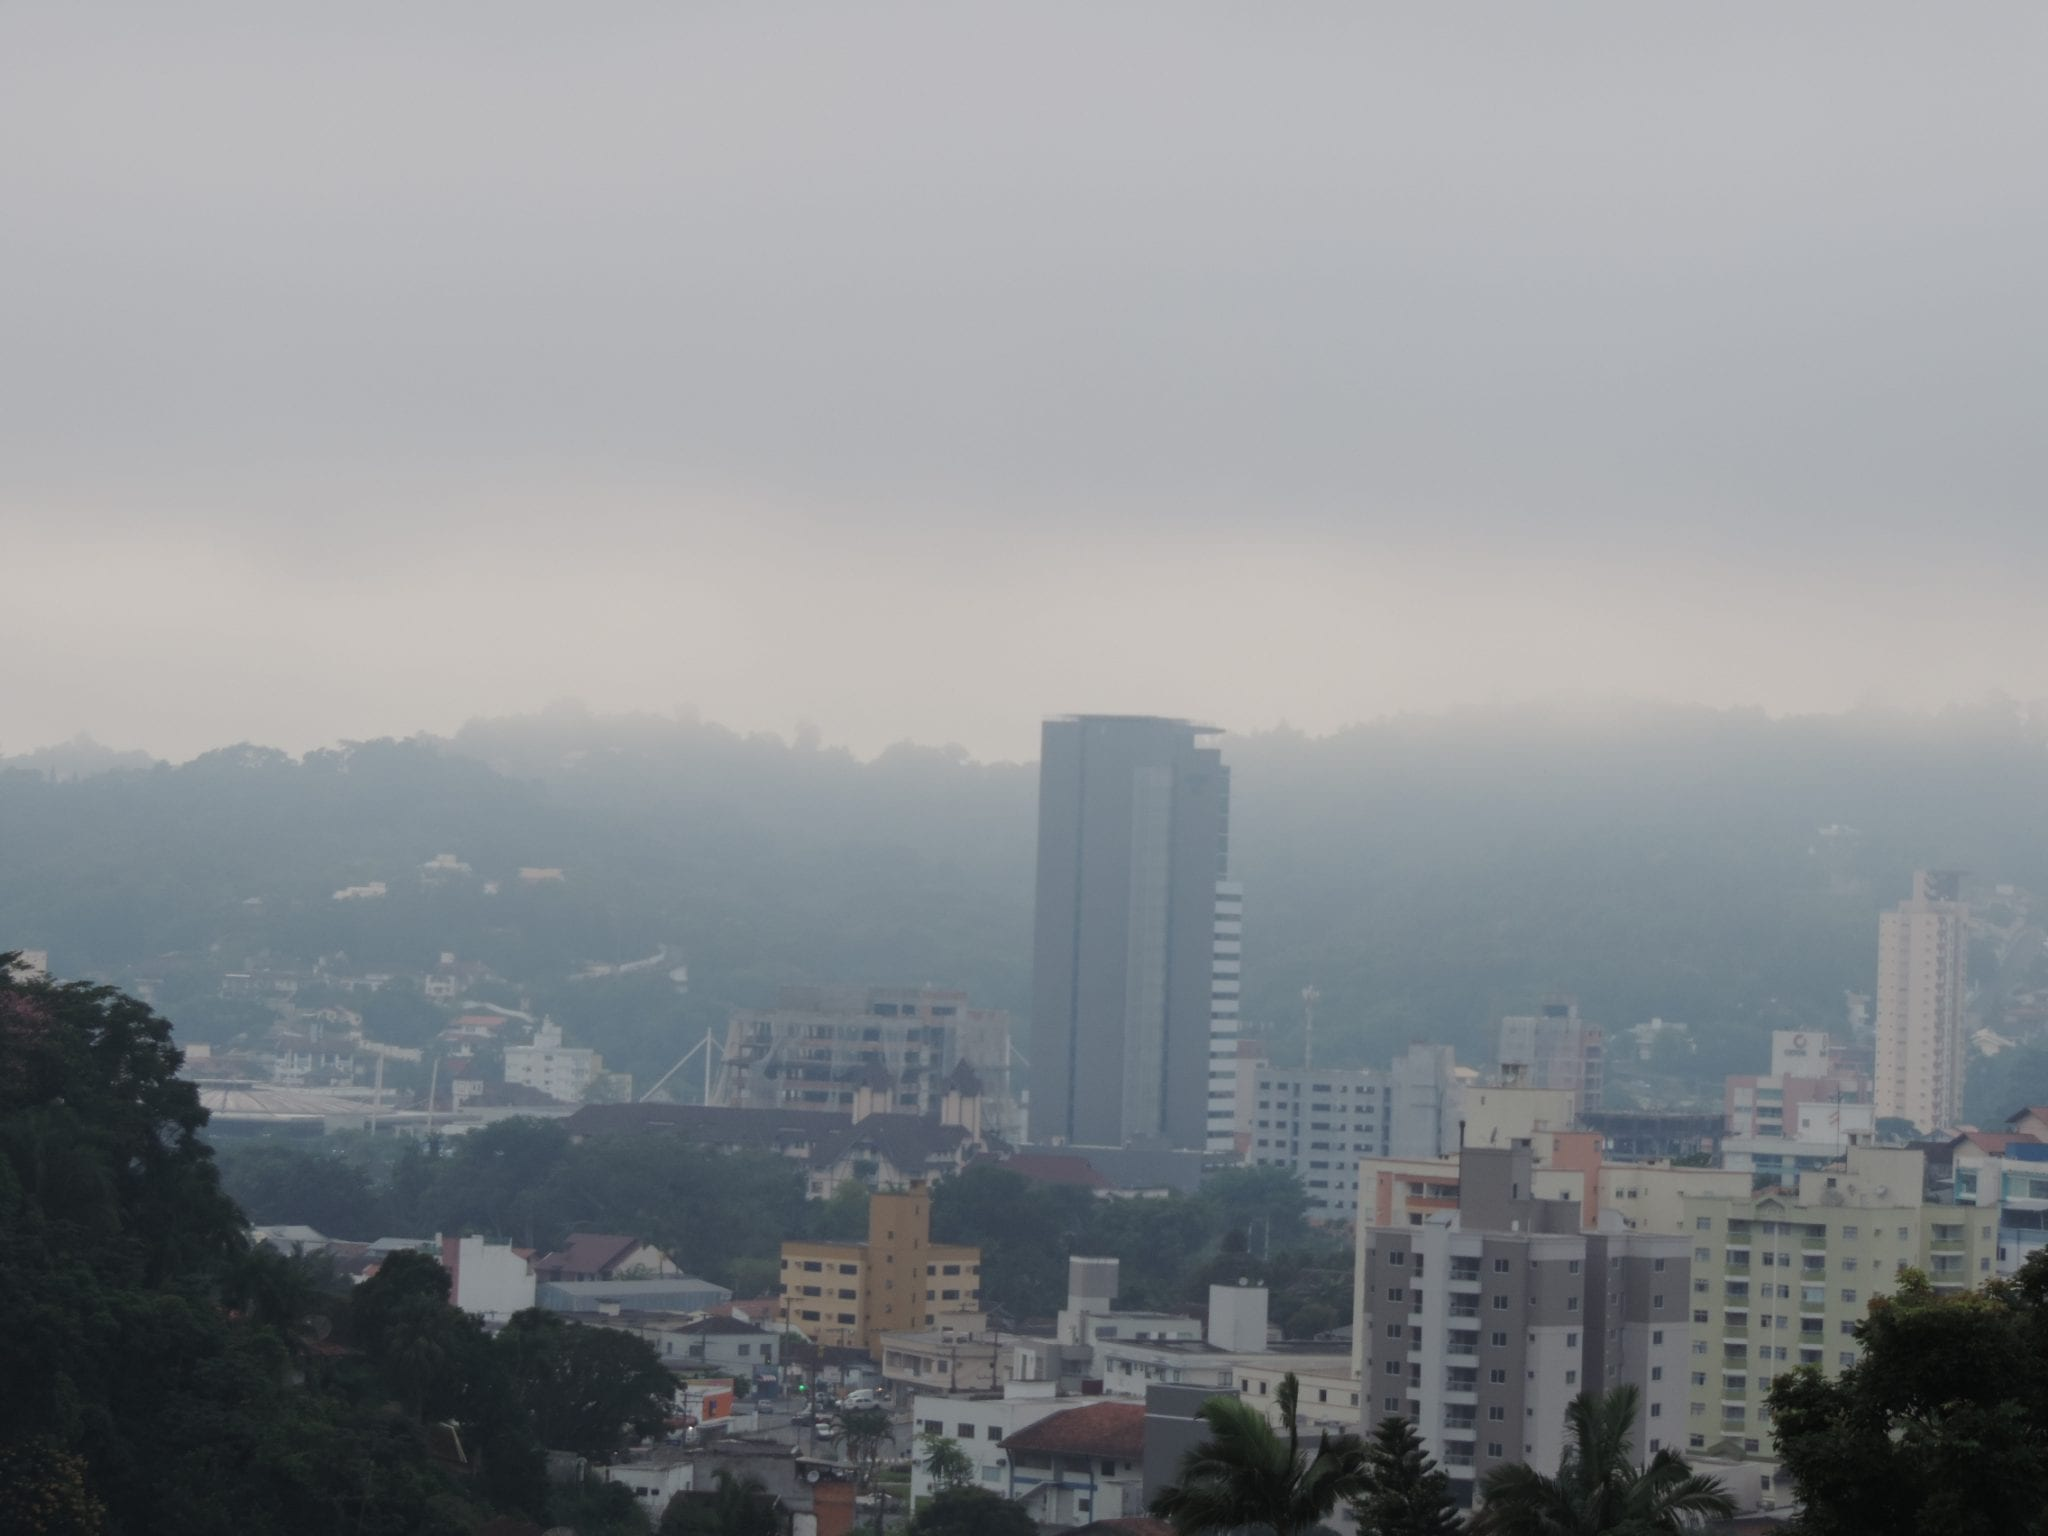 Previsão de chuva - foto de Jaime Batista